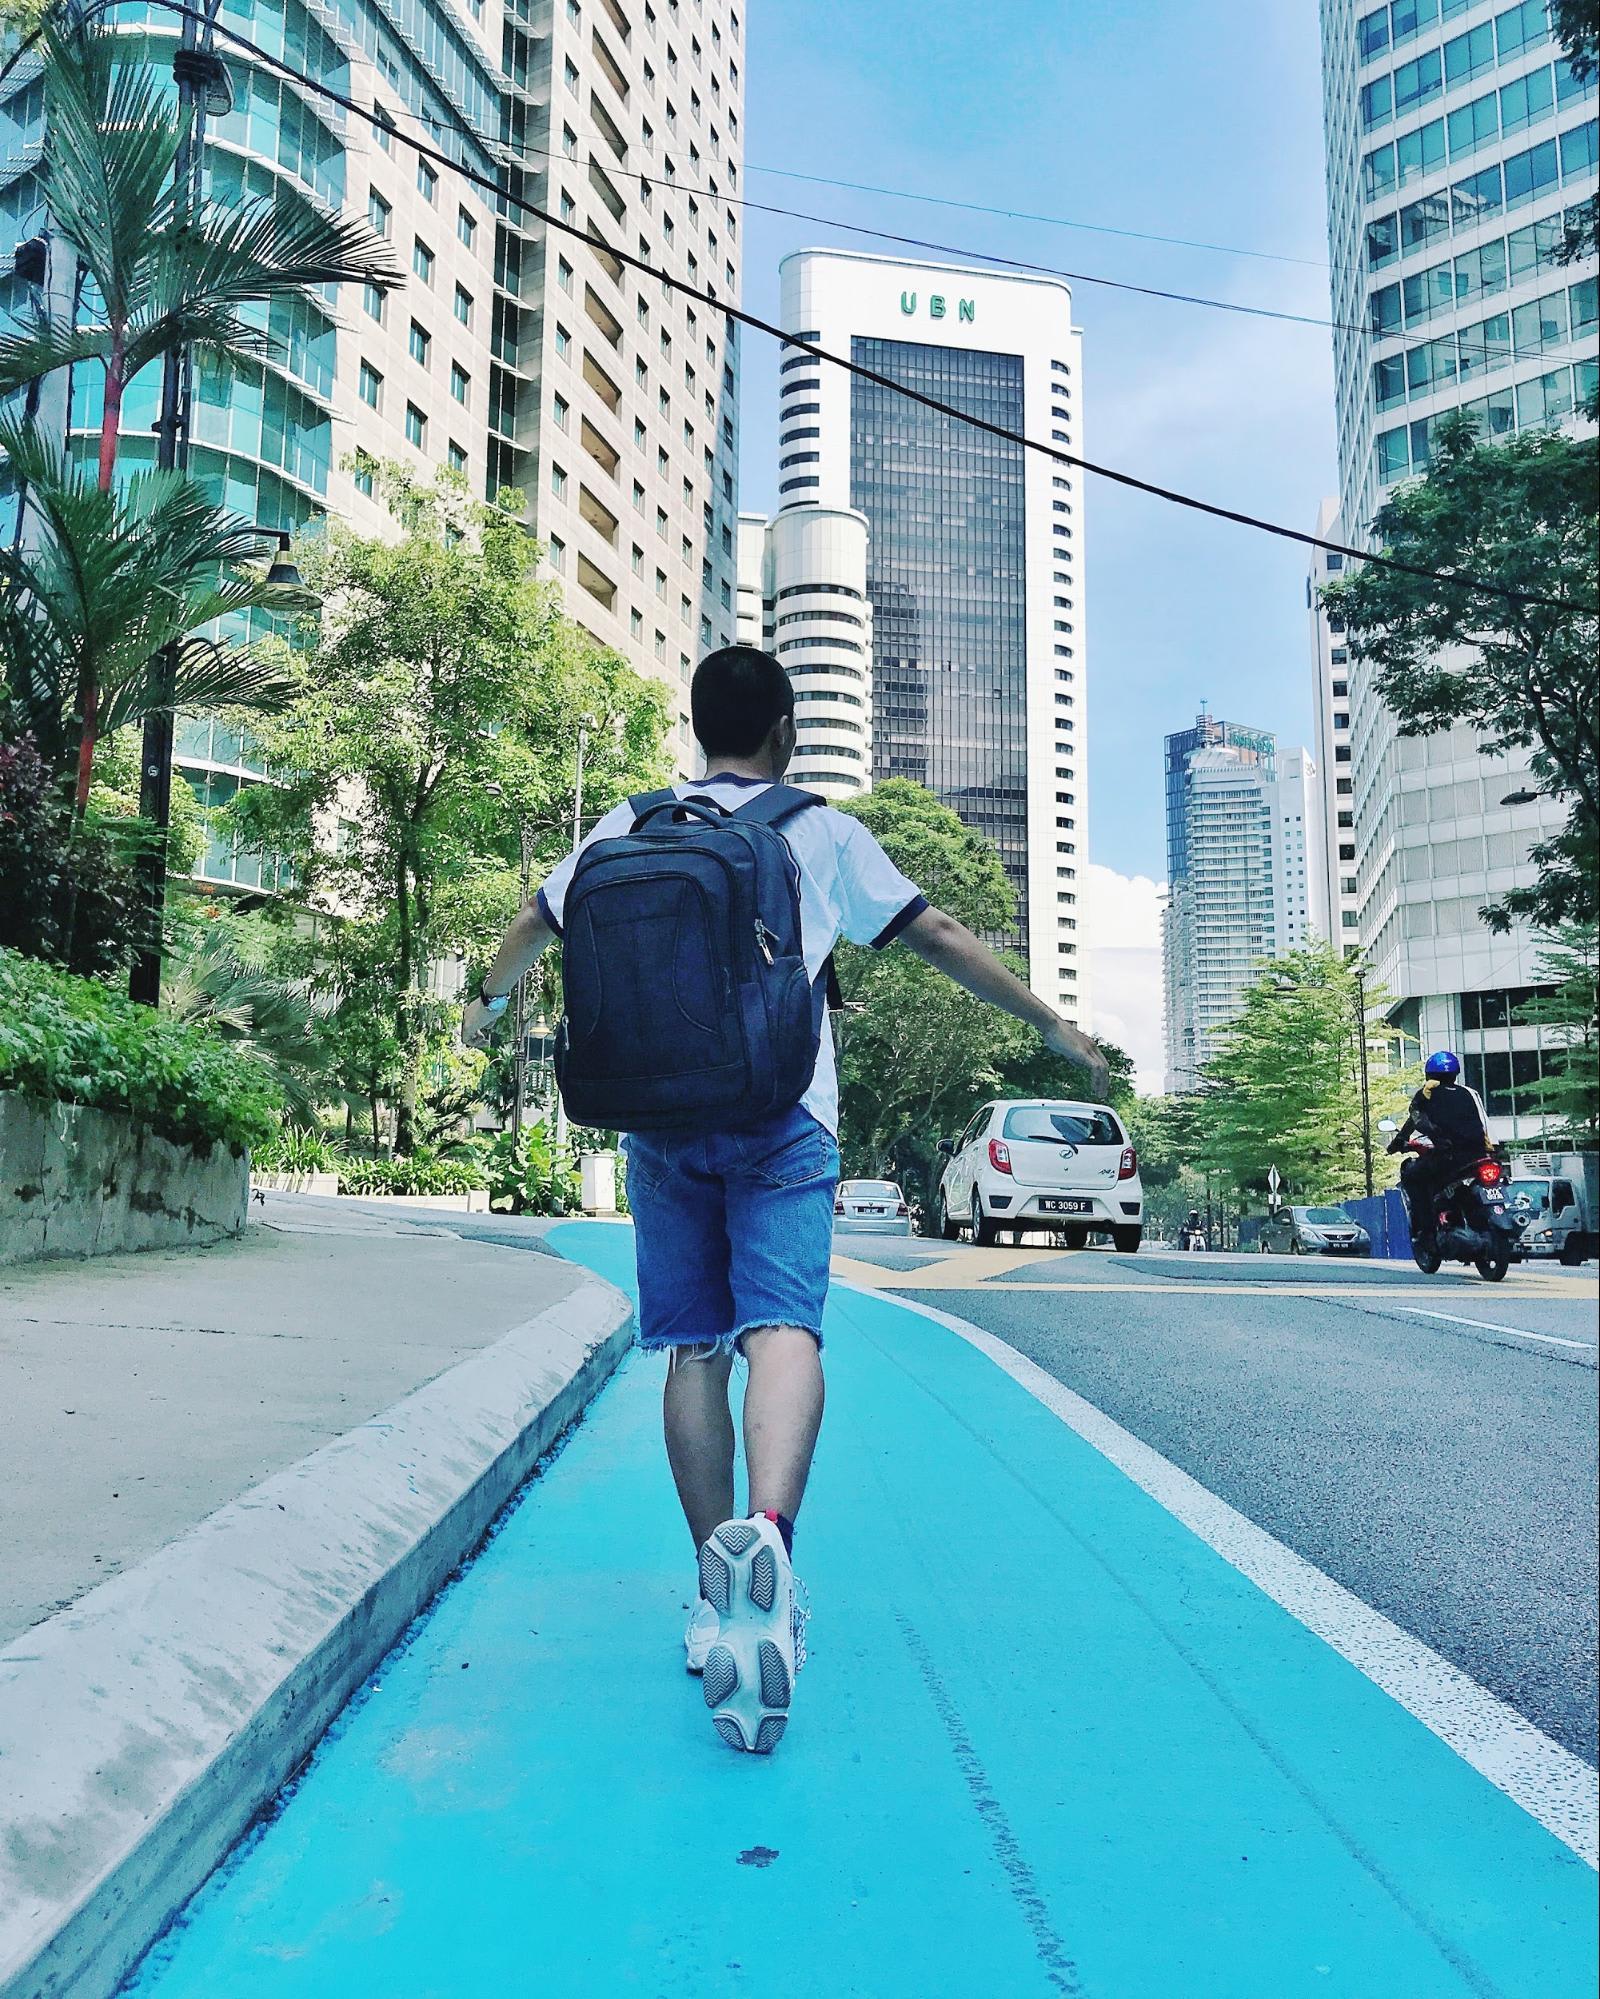 petaling street malasia